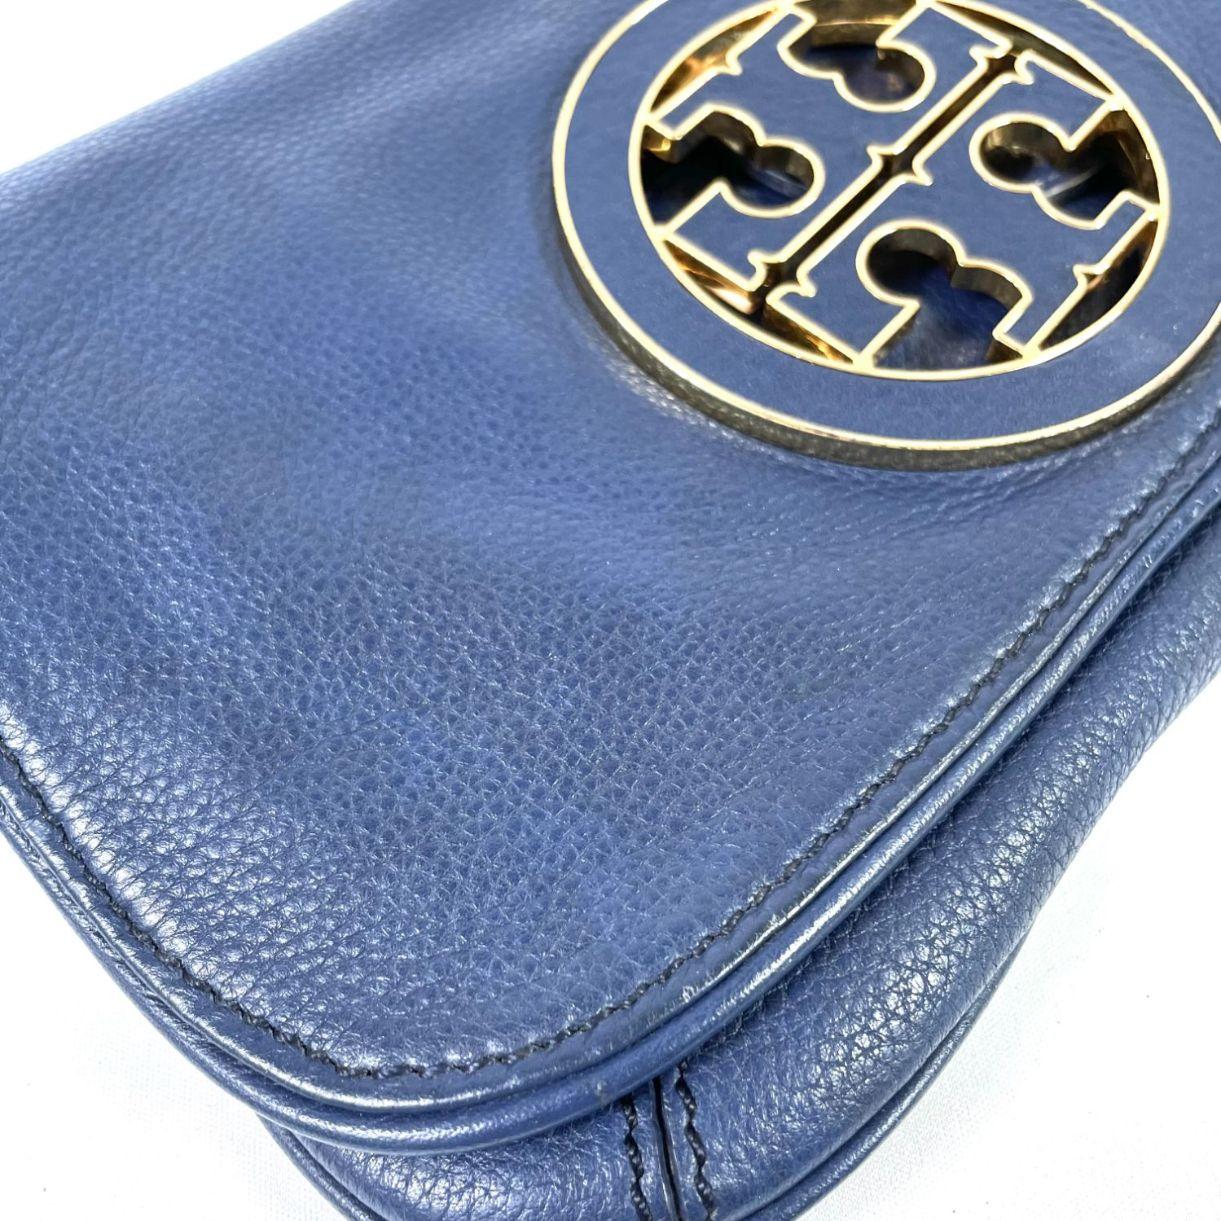 Bolsa Clutch Tory Burch Amanda Reva Azul